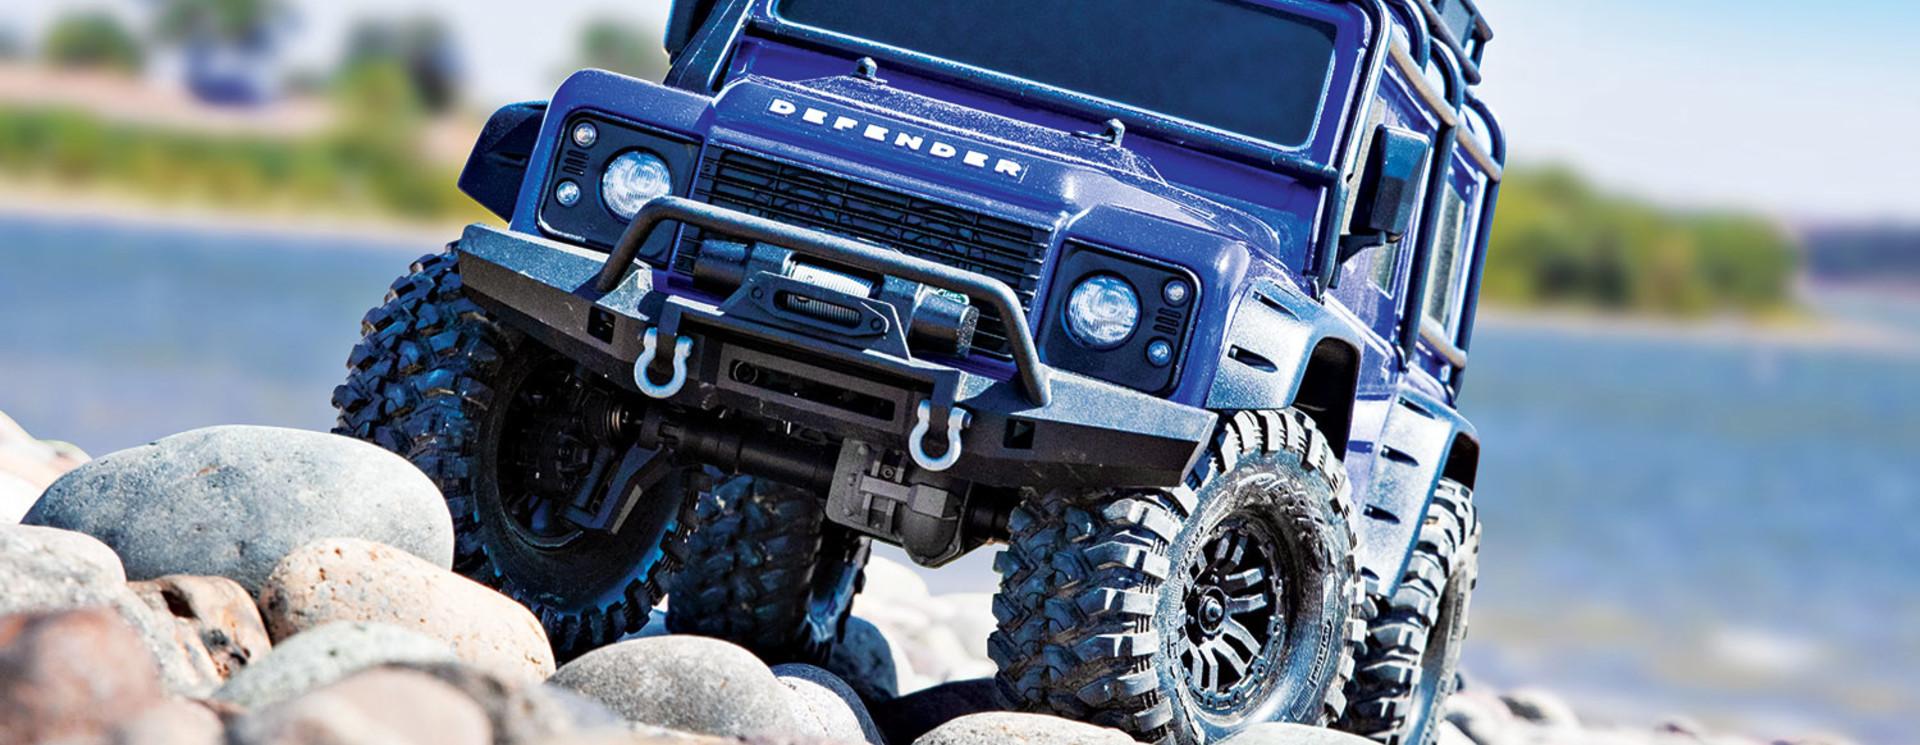 Tekening TRX-4 Defender/Bronco/Blazer/Mercedes